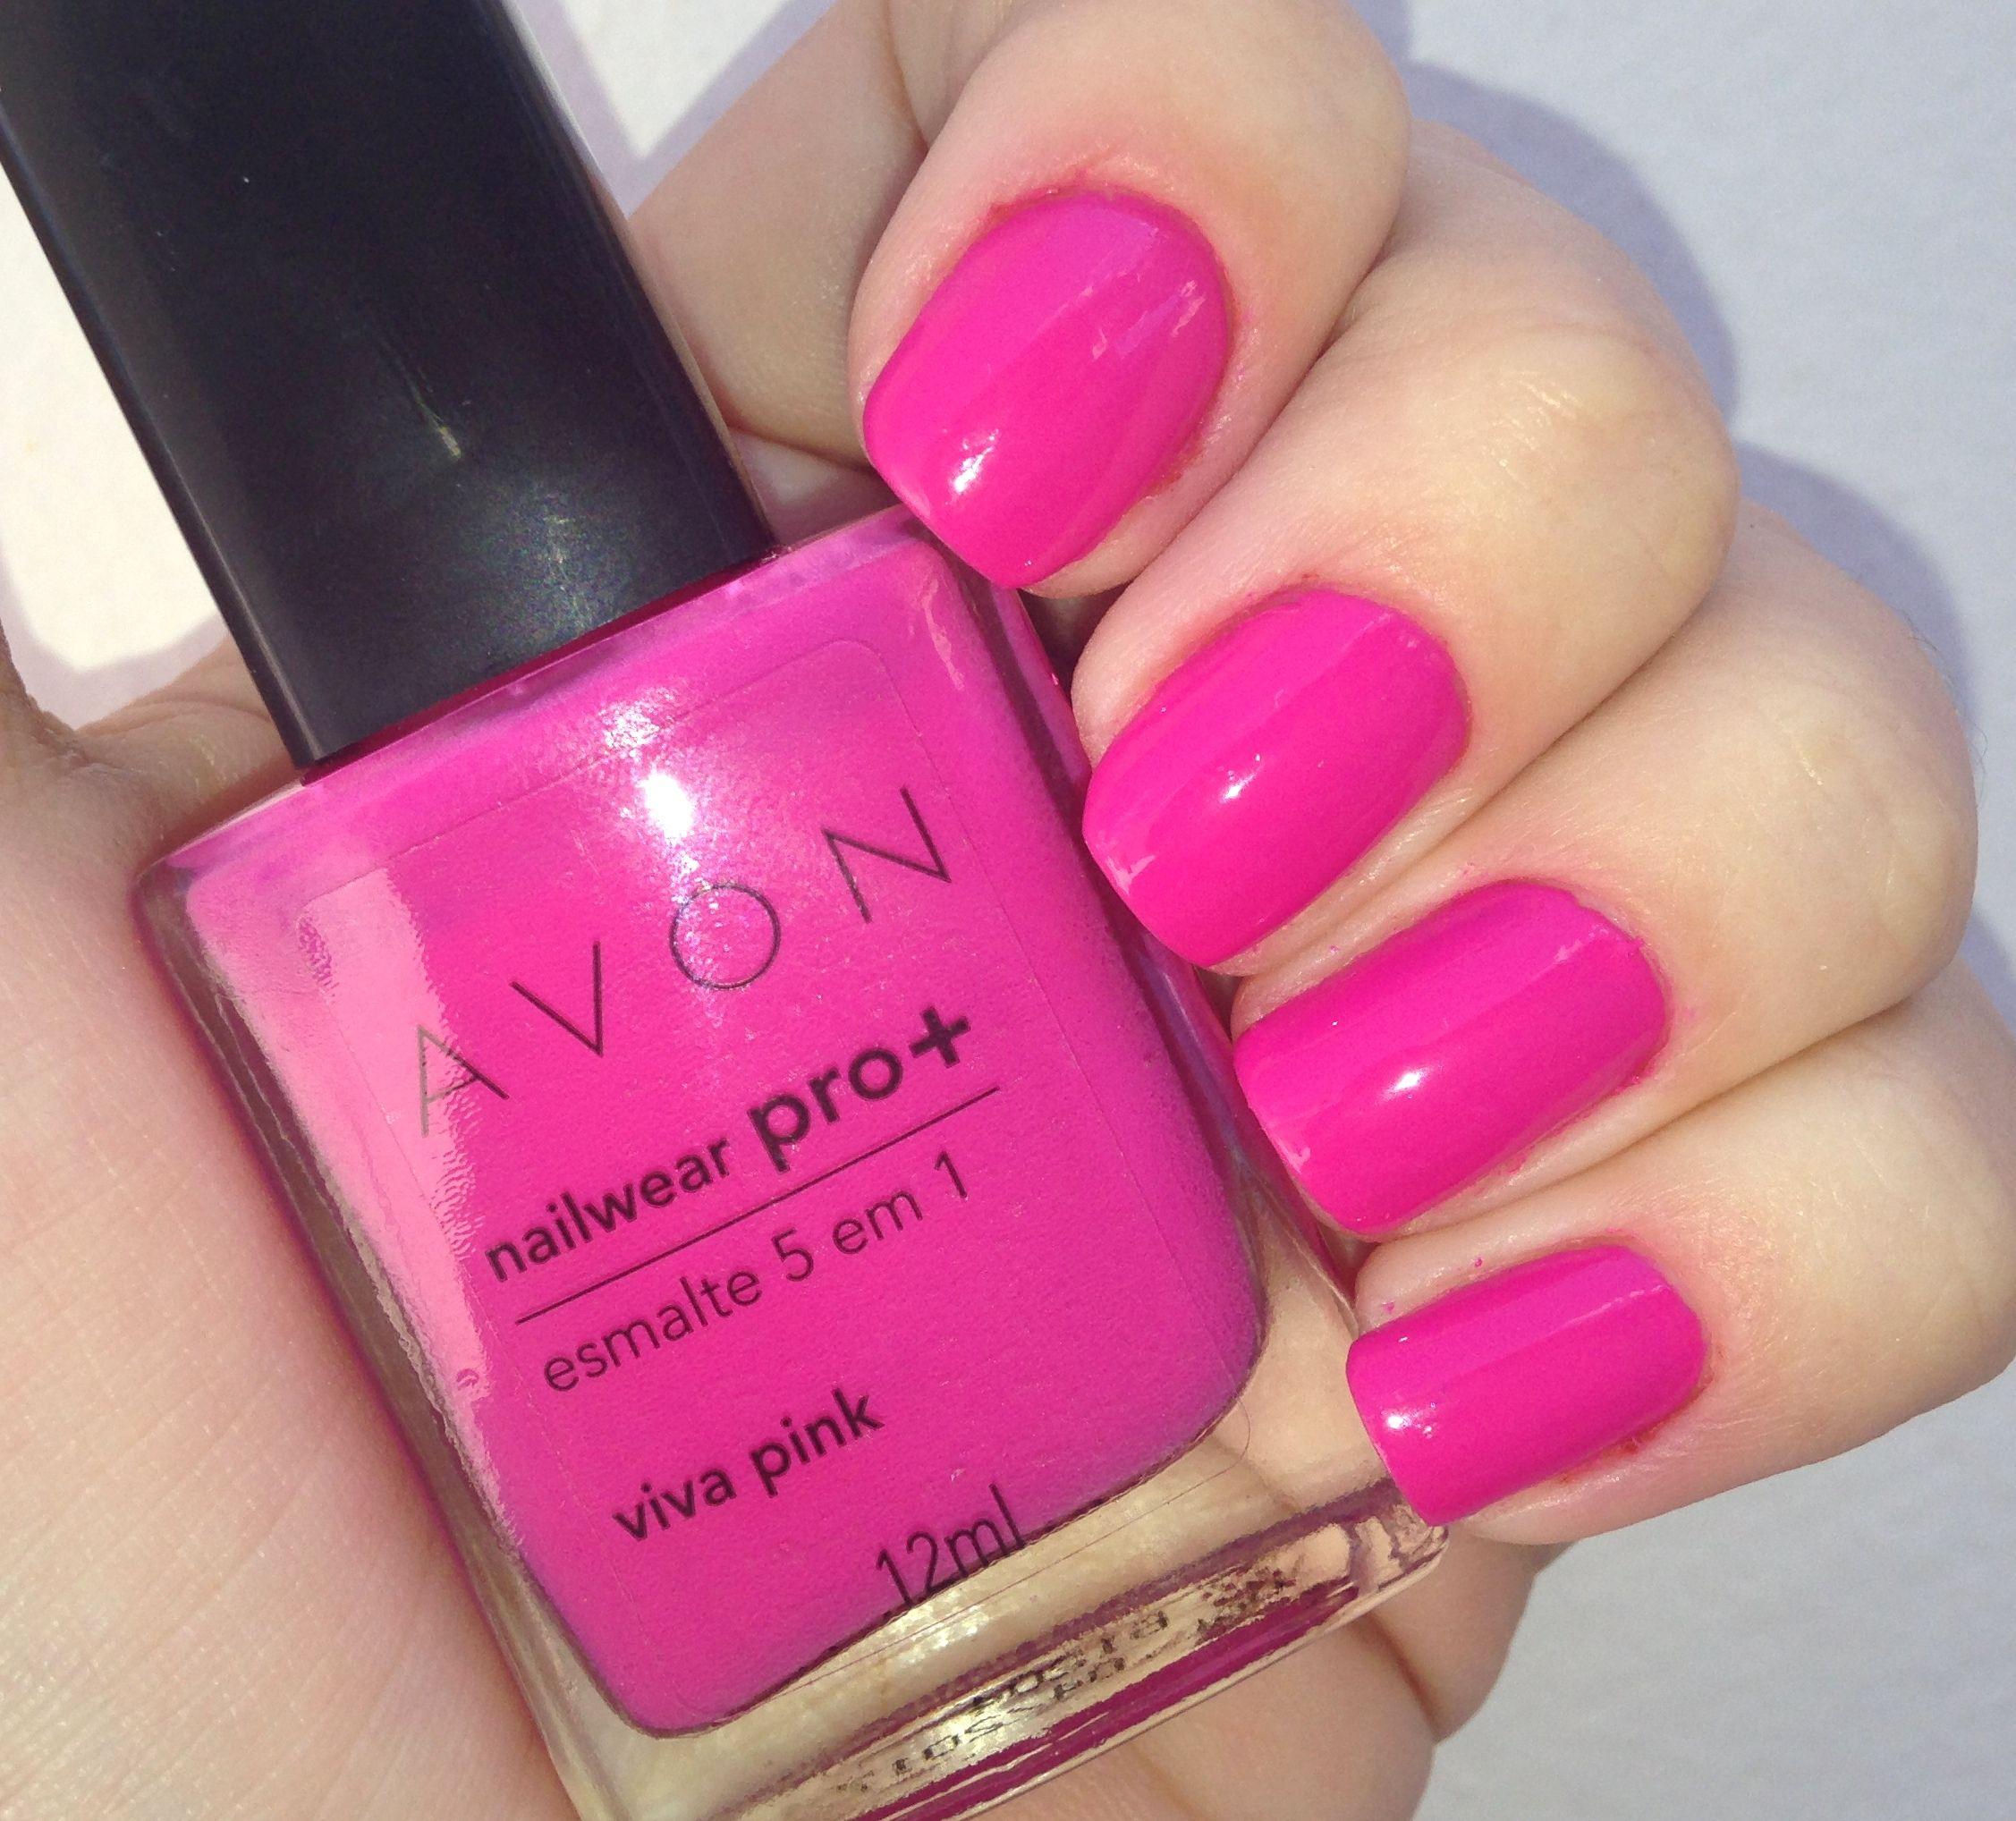 Esmalte Avon Viva Pink - Pesquisa Google